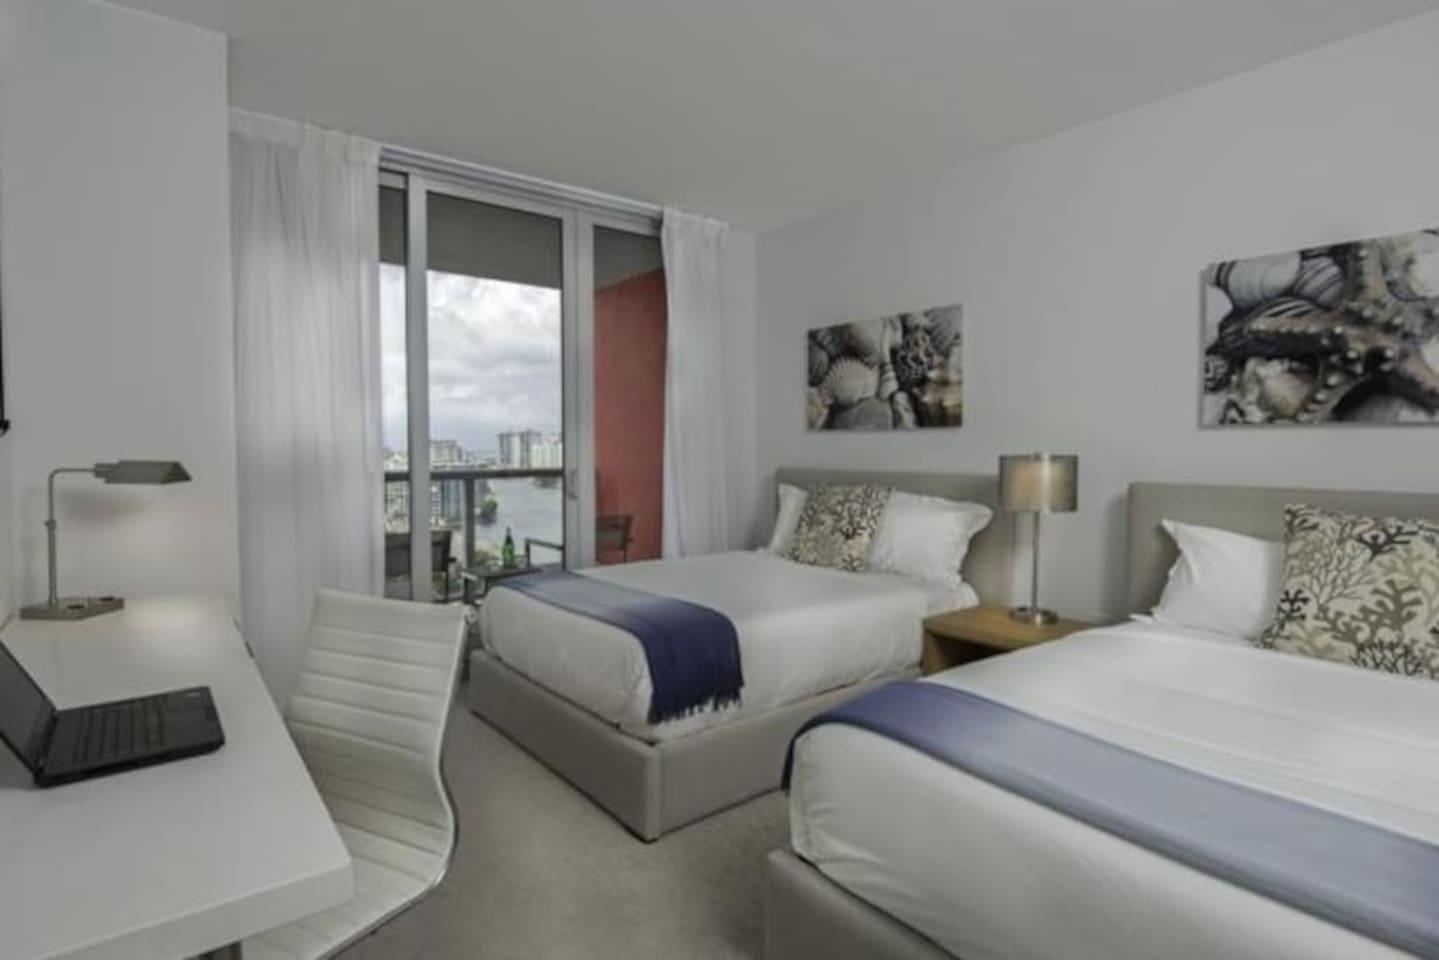 Executive Room at BeachWalk Resort ! Two beds